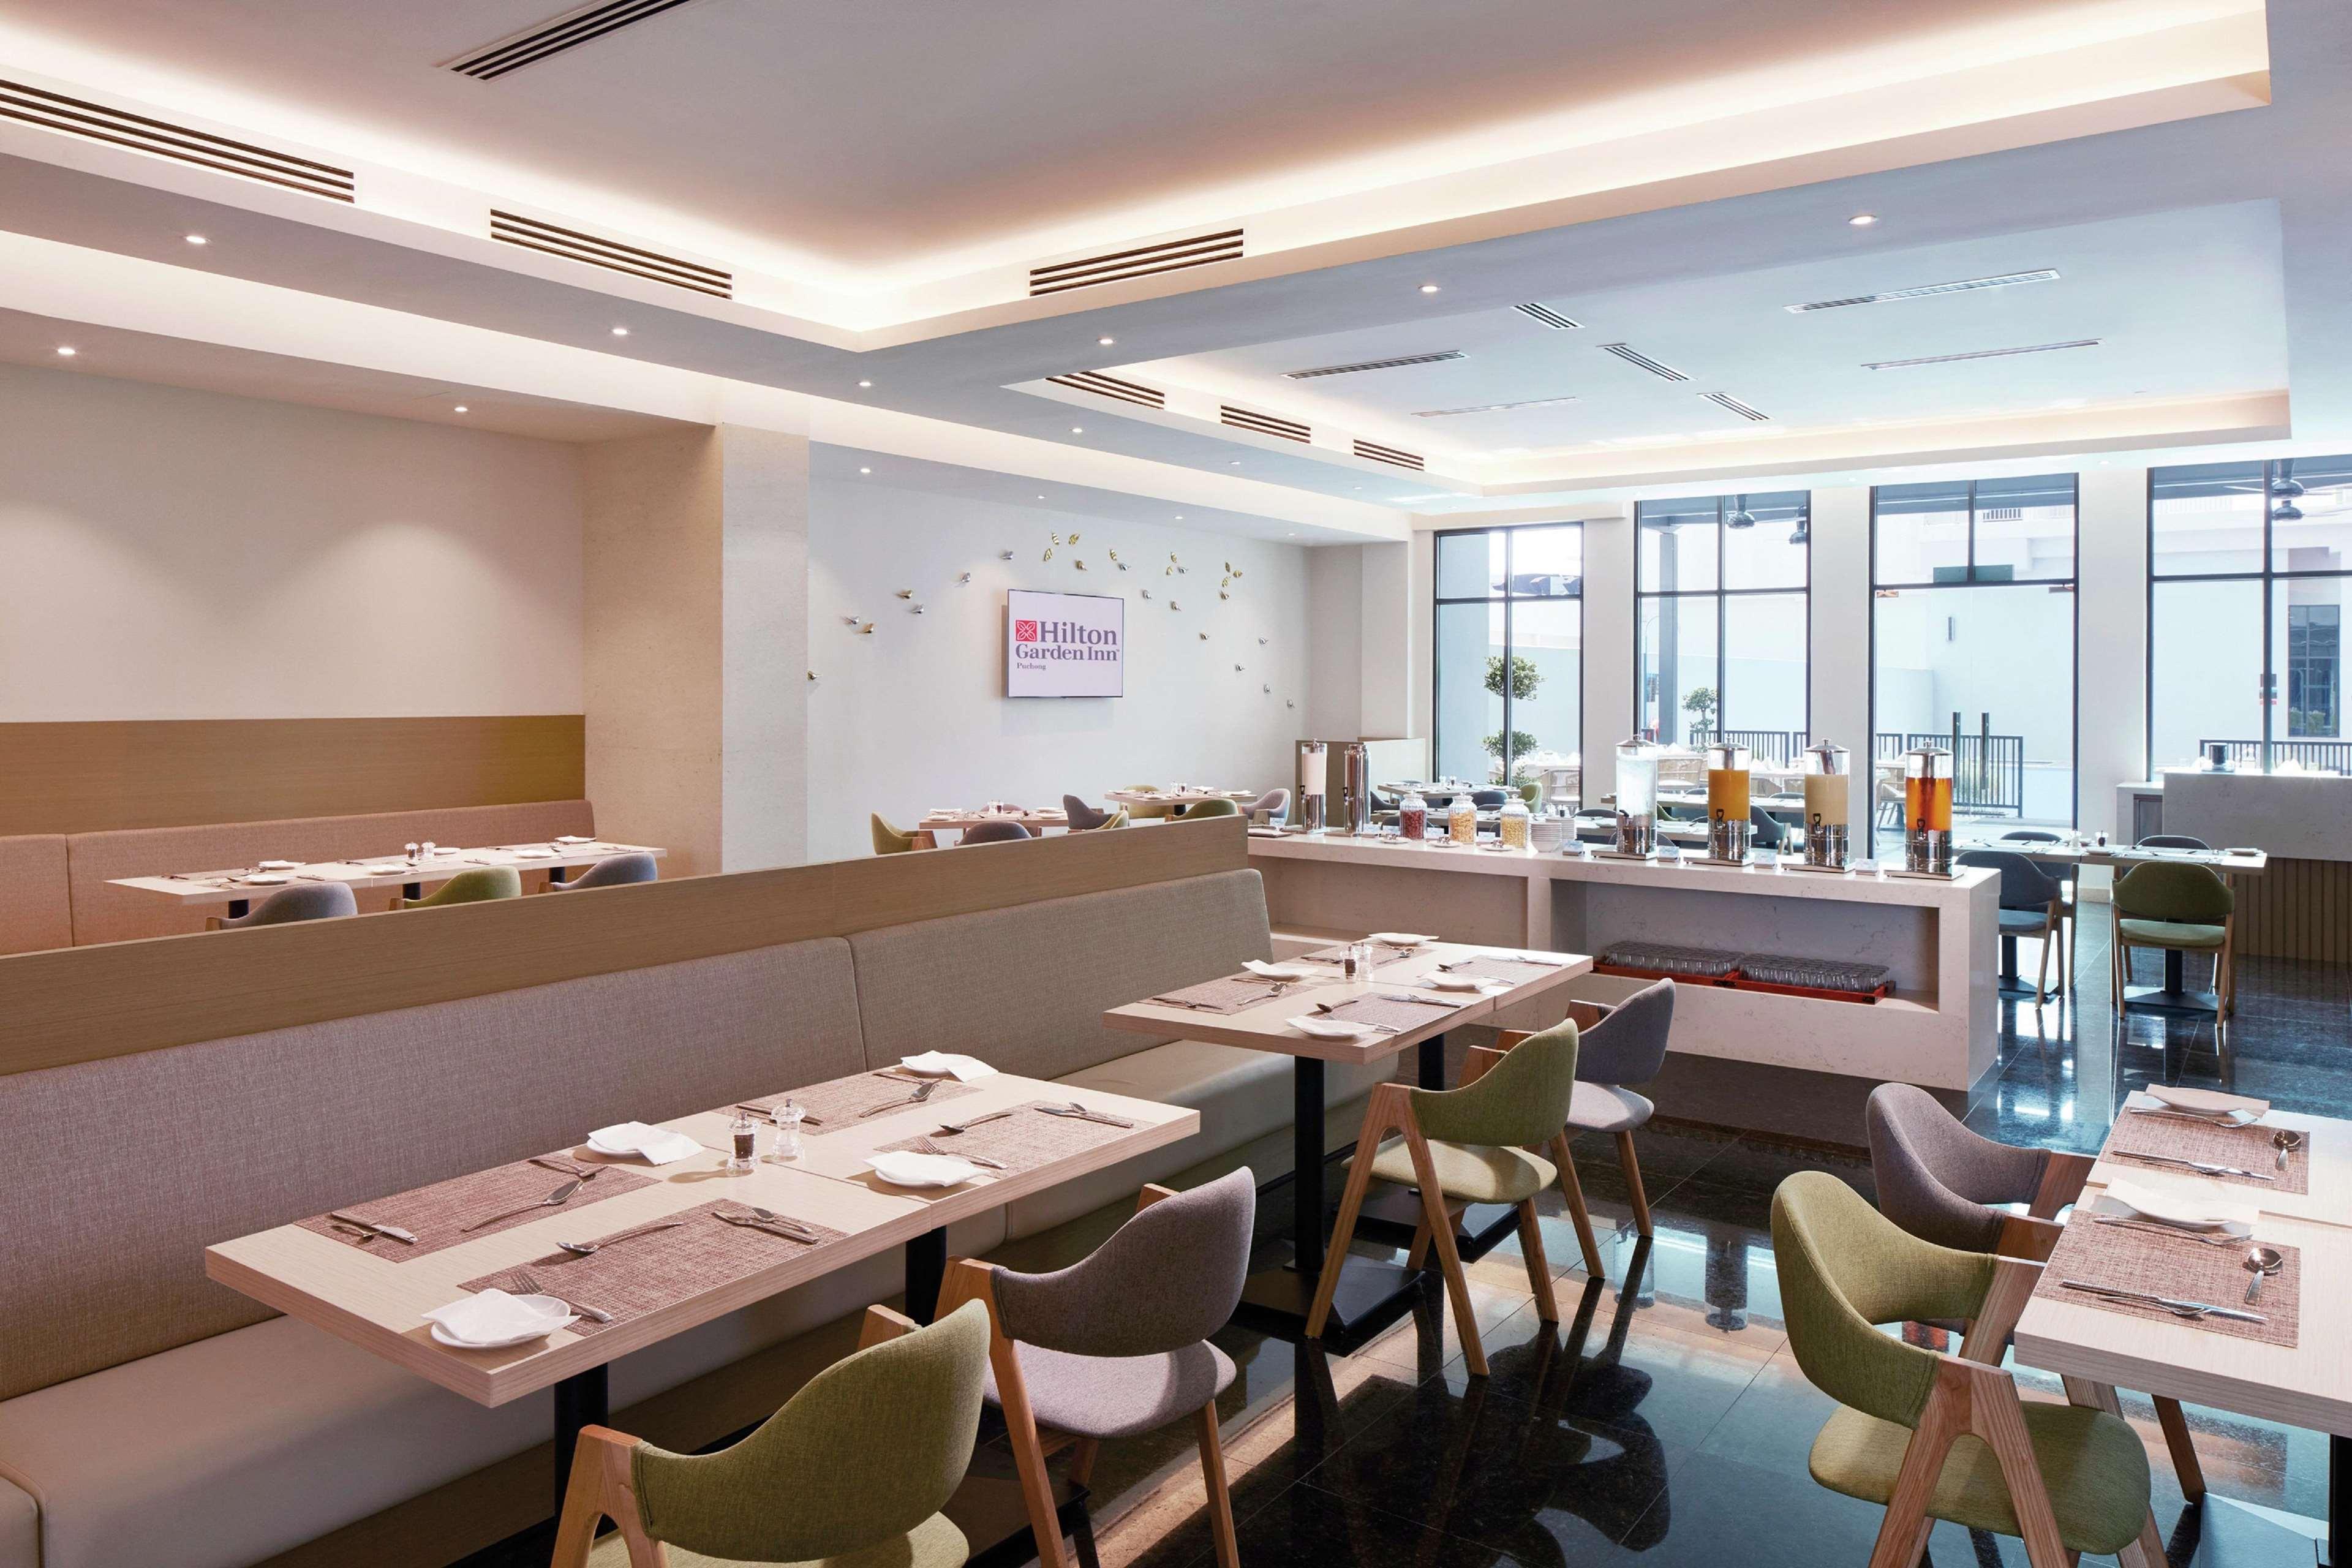 Hilton Garden Inn Puchong Petaling Jaya Price Address Reviews